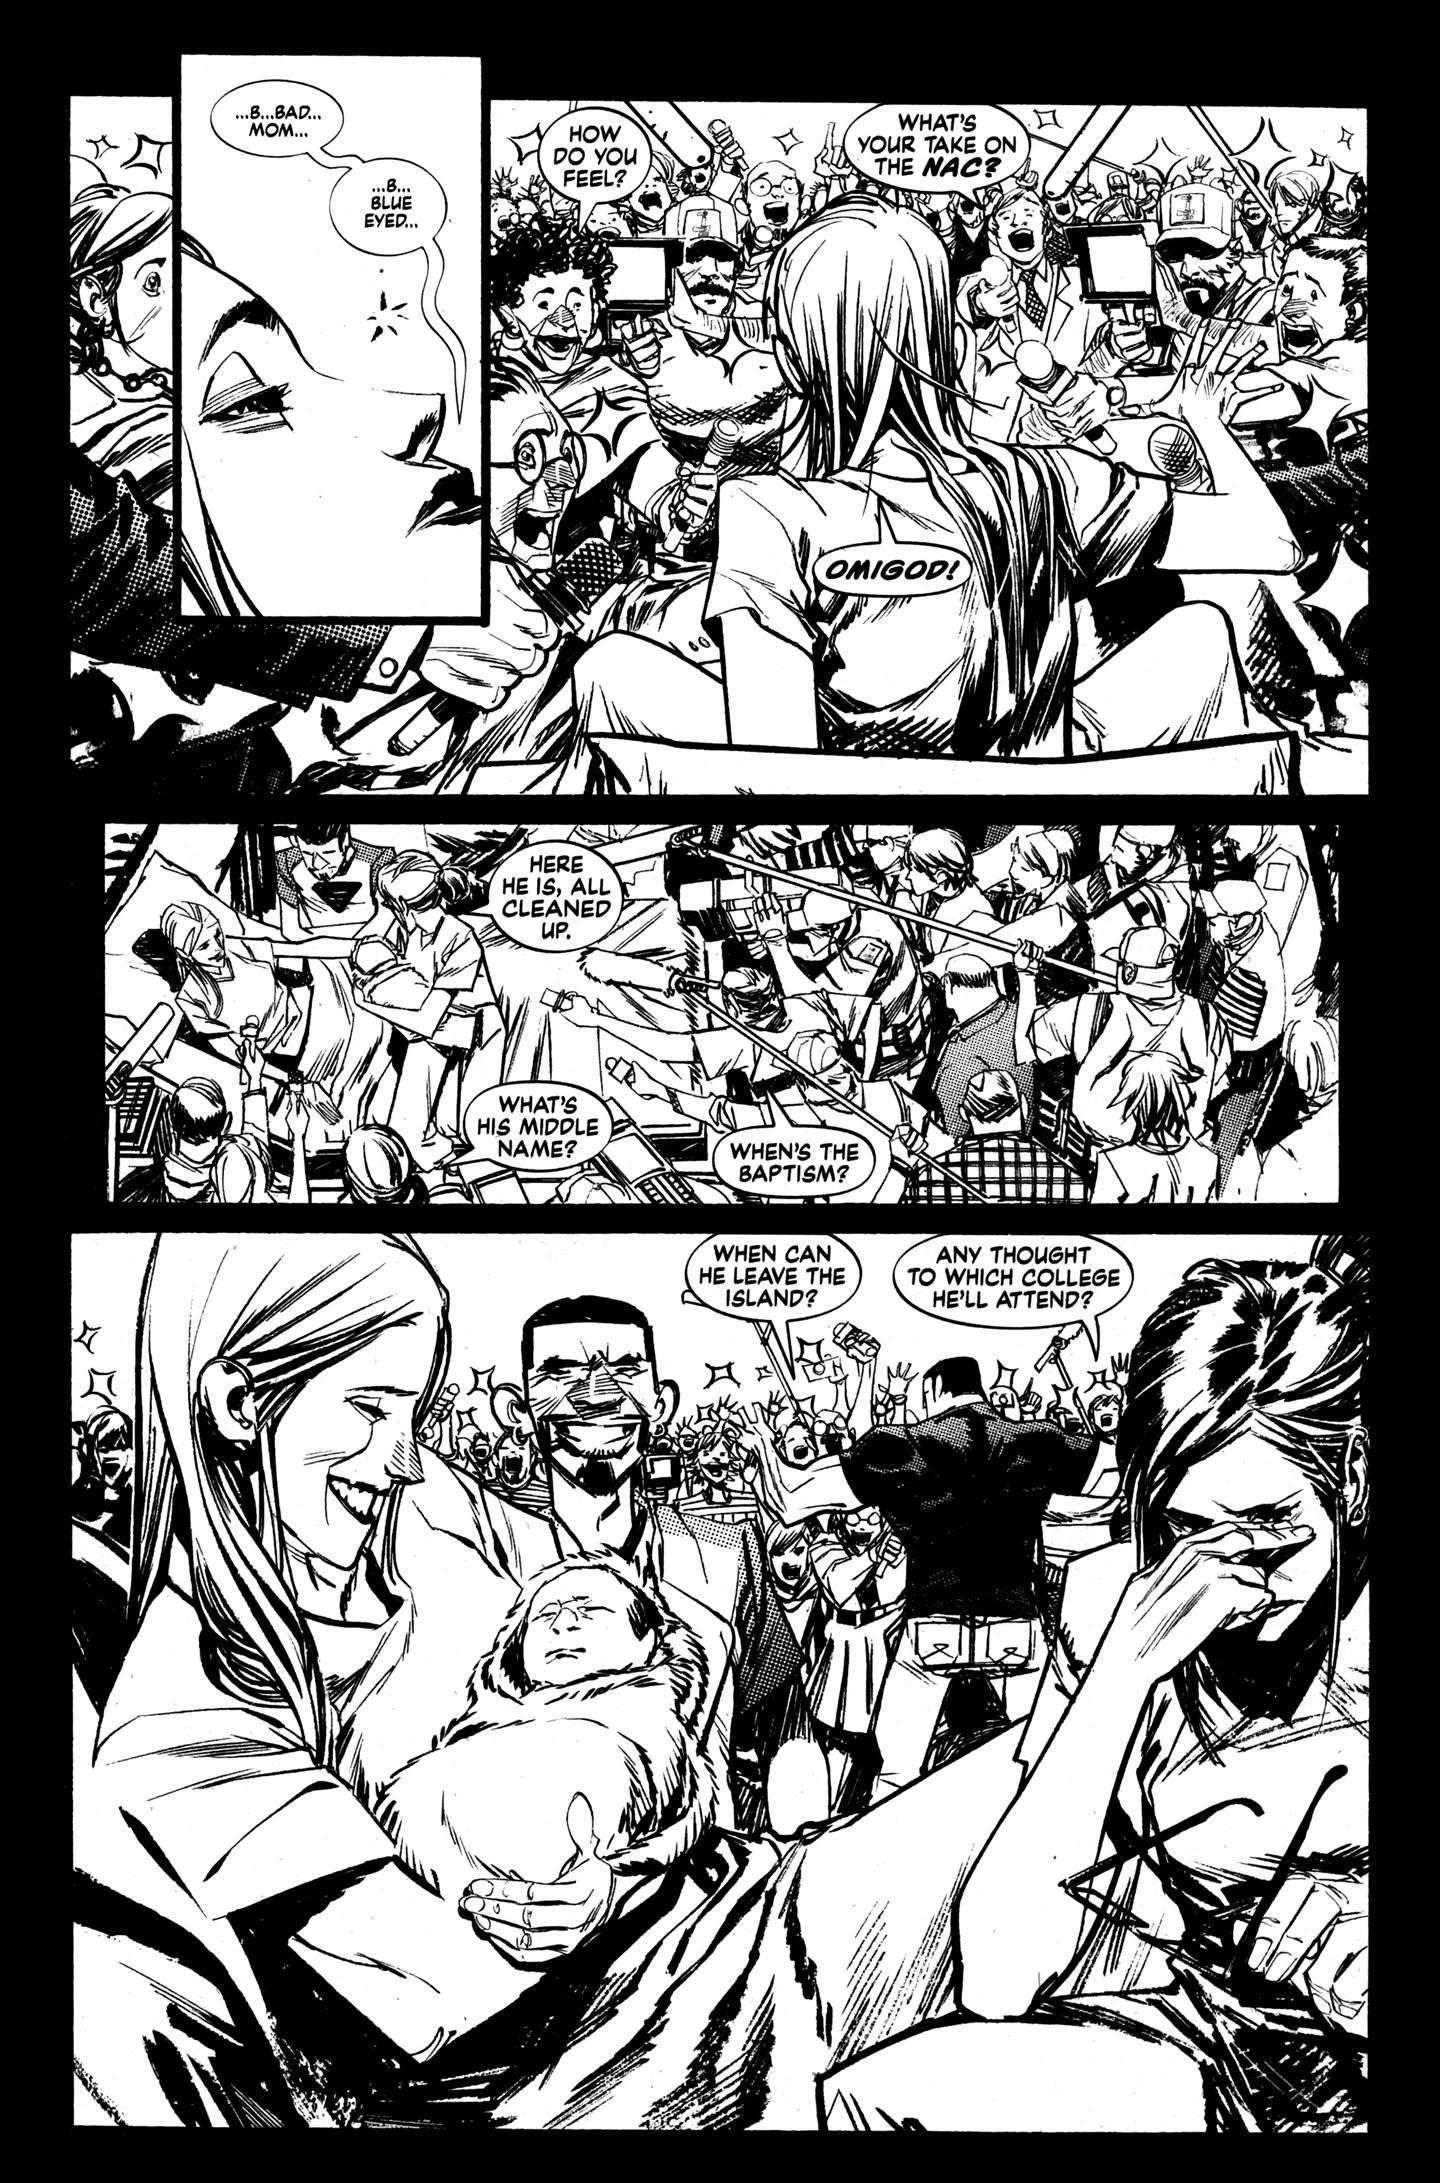 Read online American Vampire: Lord of Nightmares comic -  Issue #2 - 27